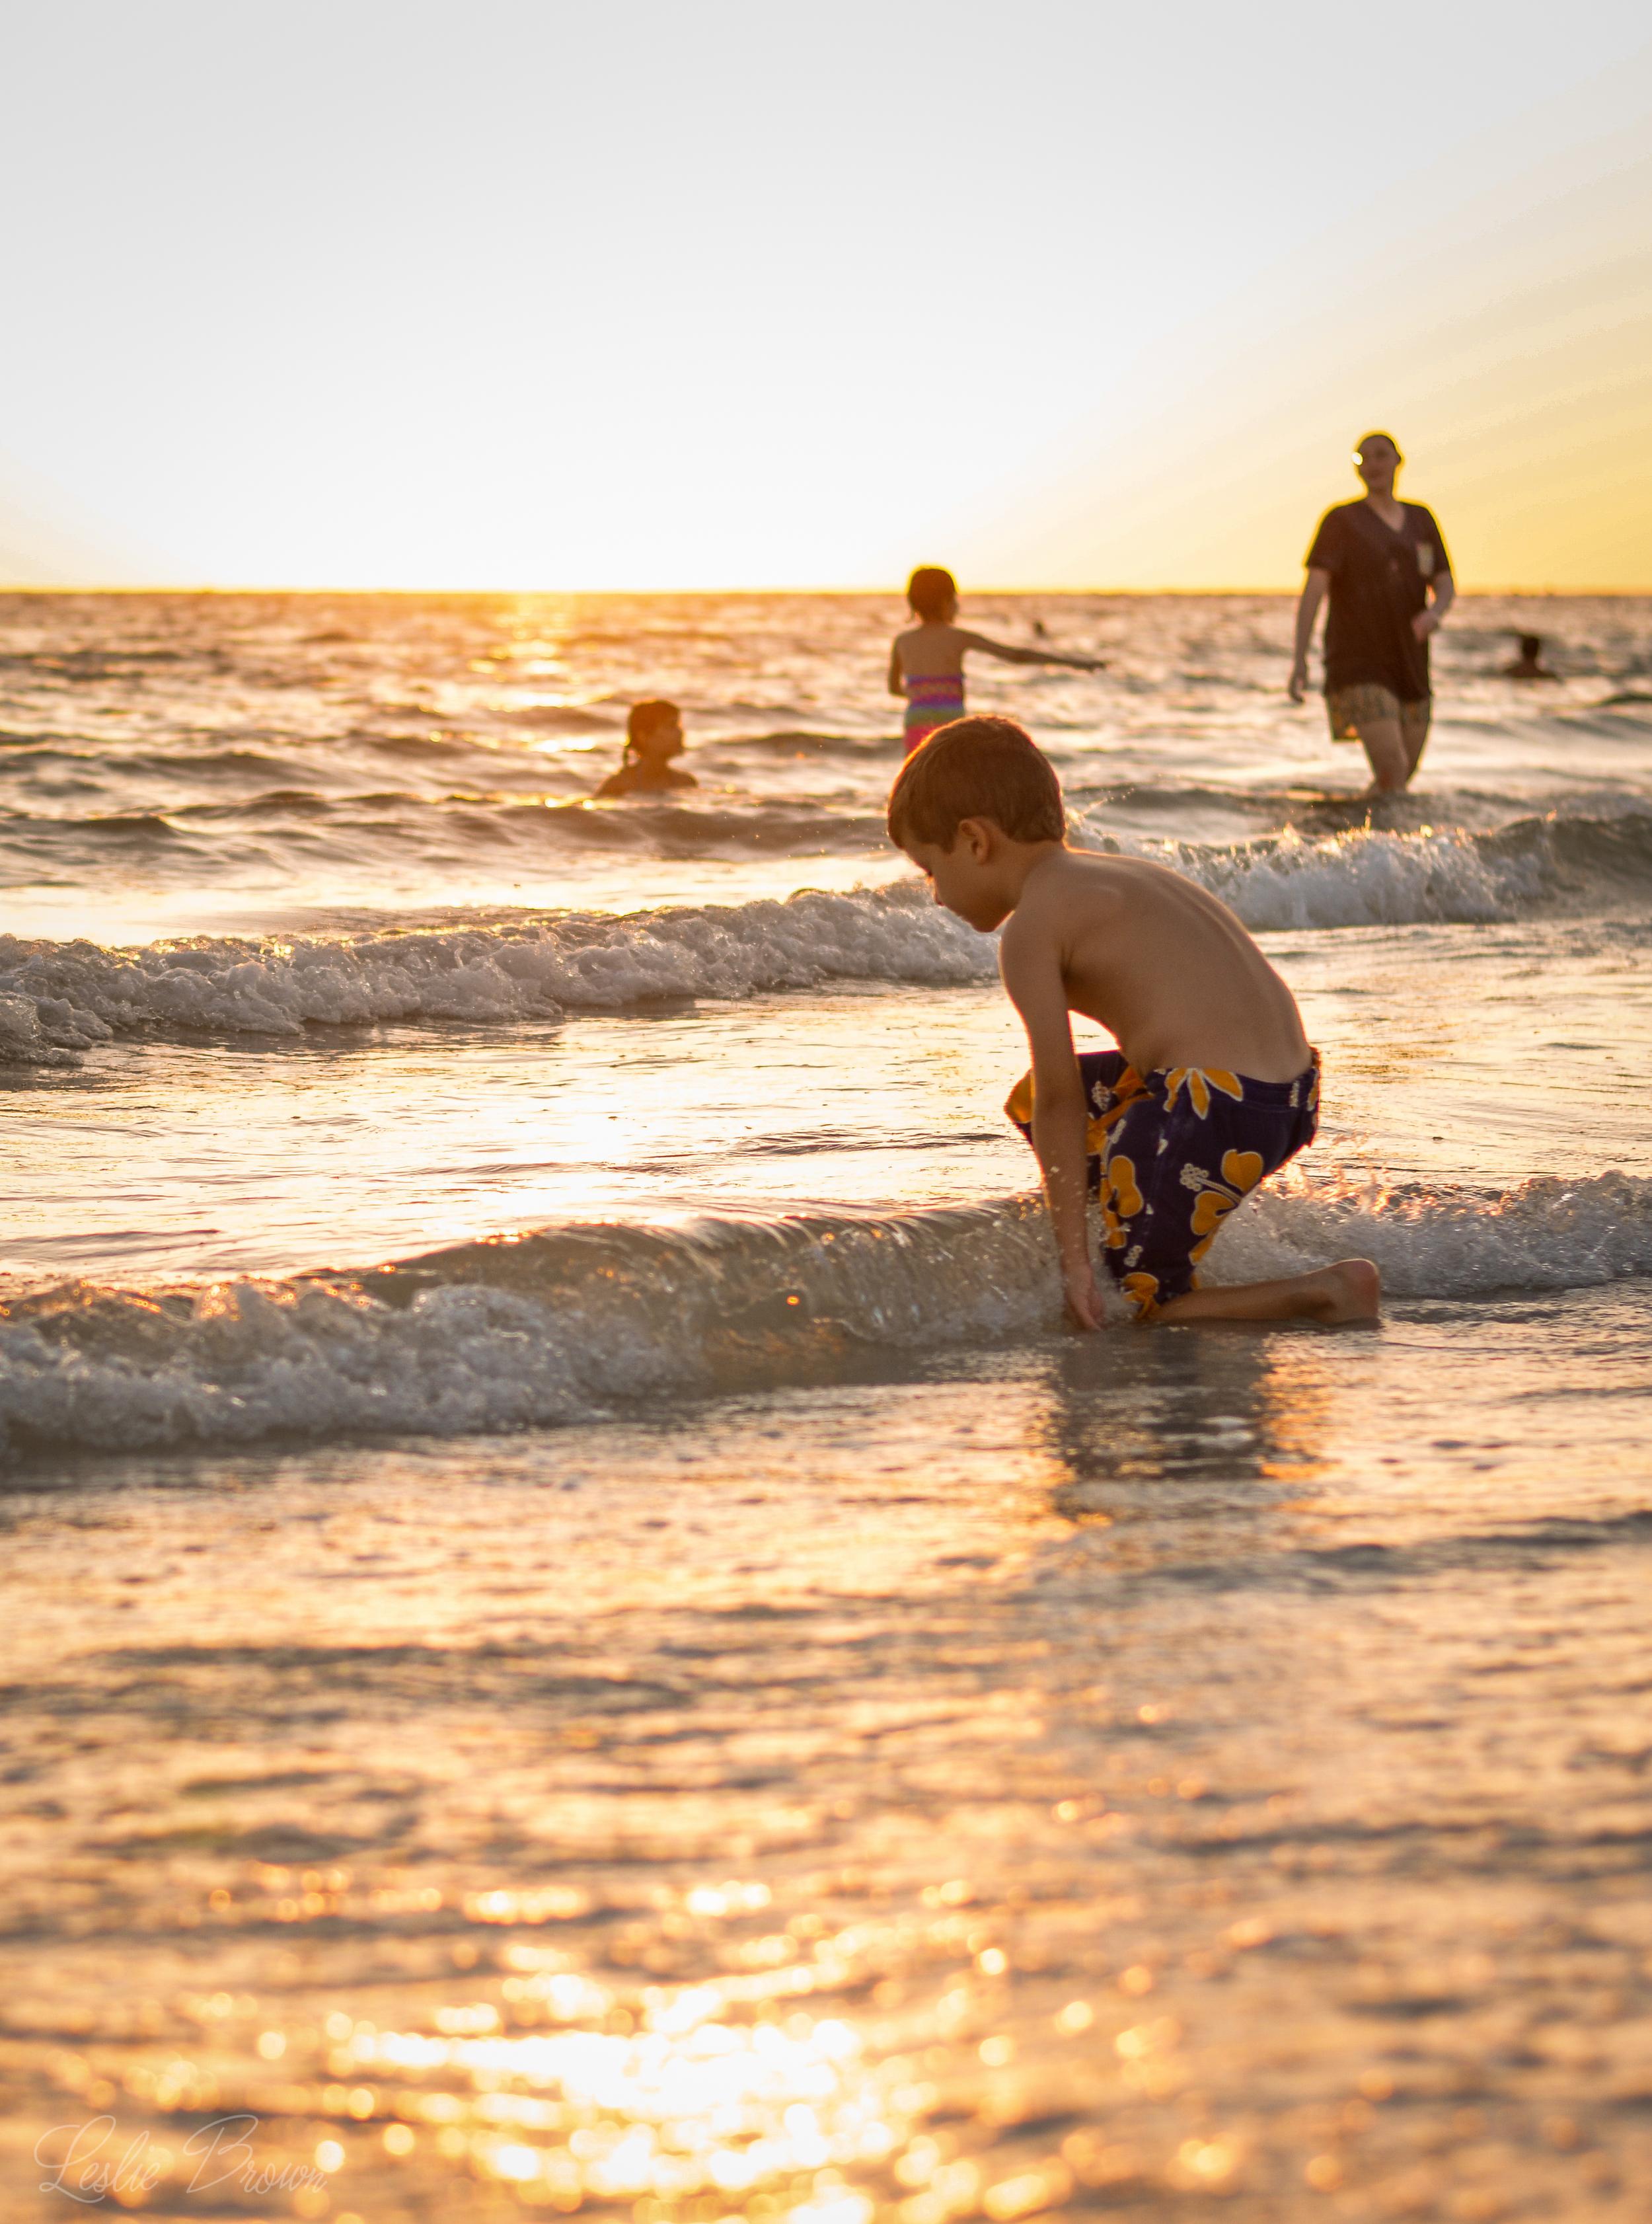 Waves and Children - Leslie Brown